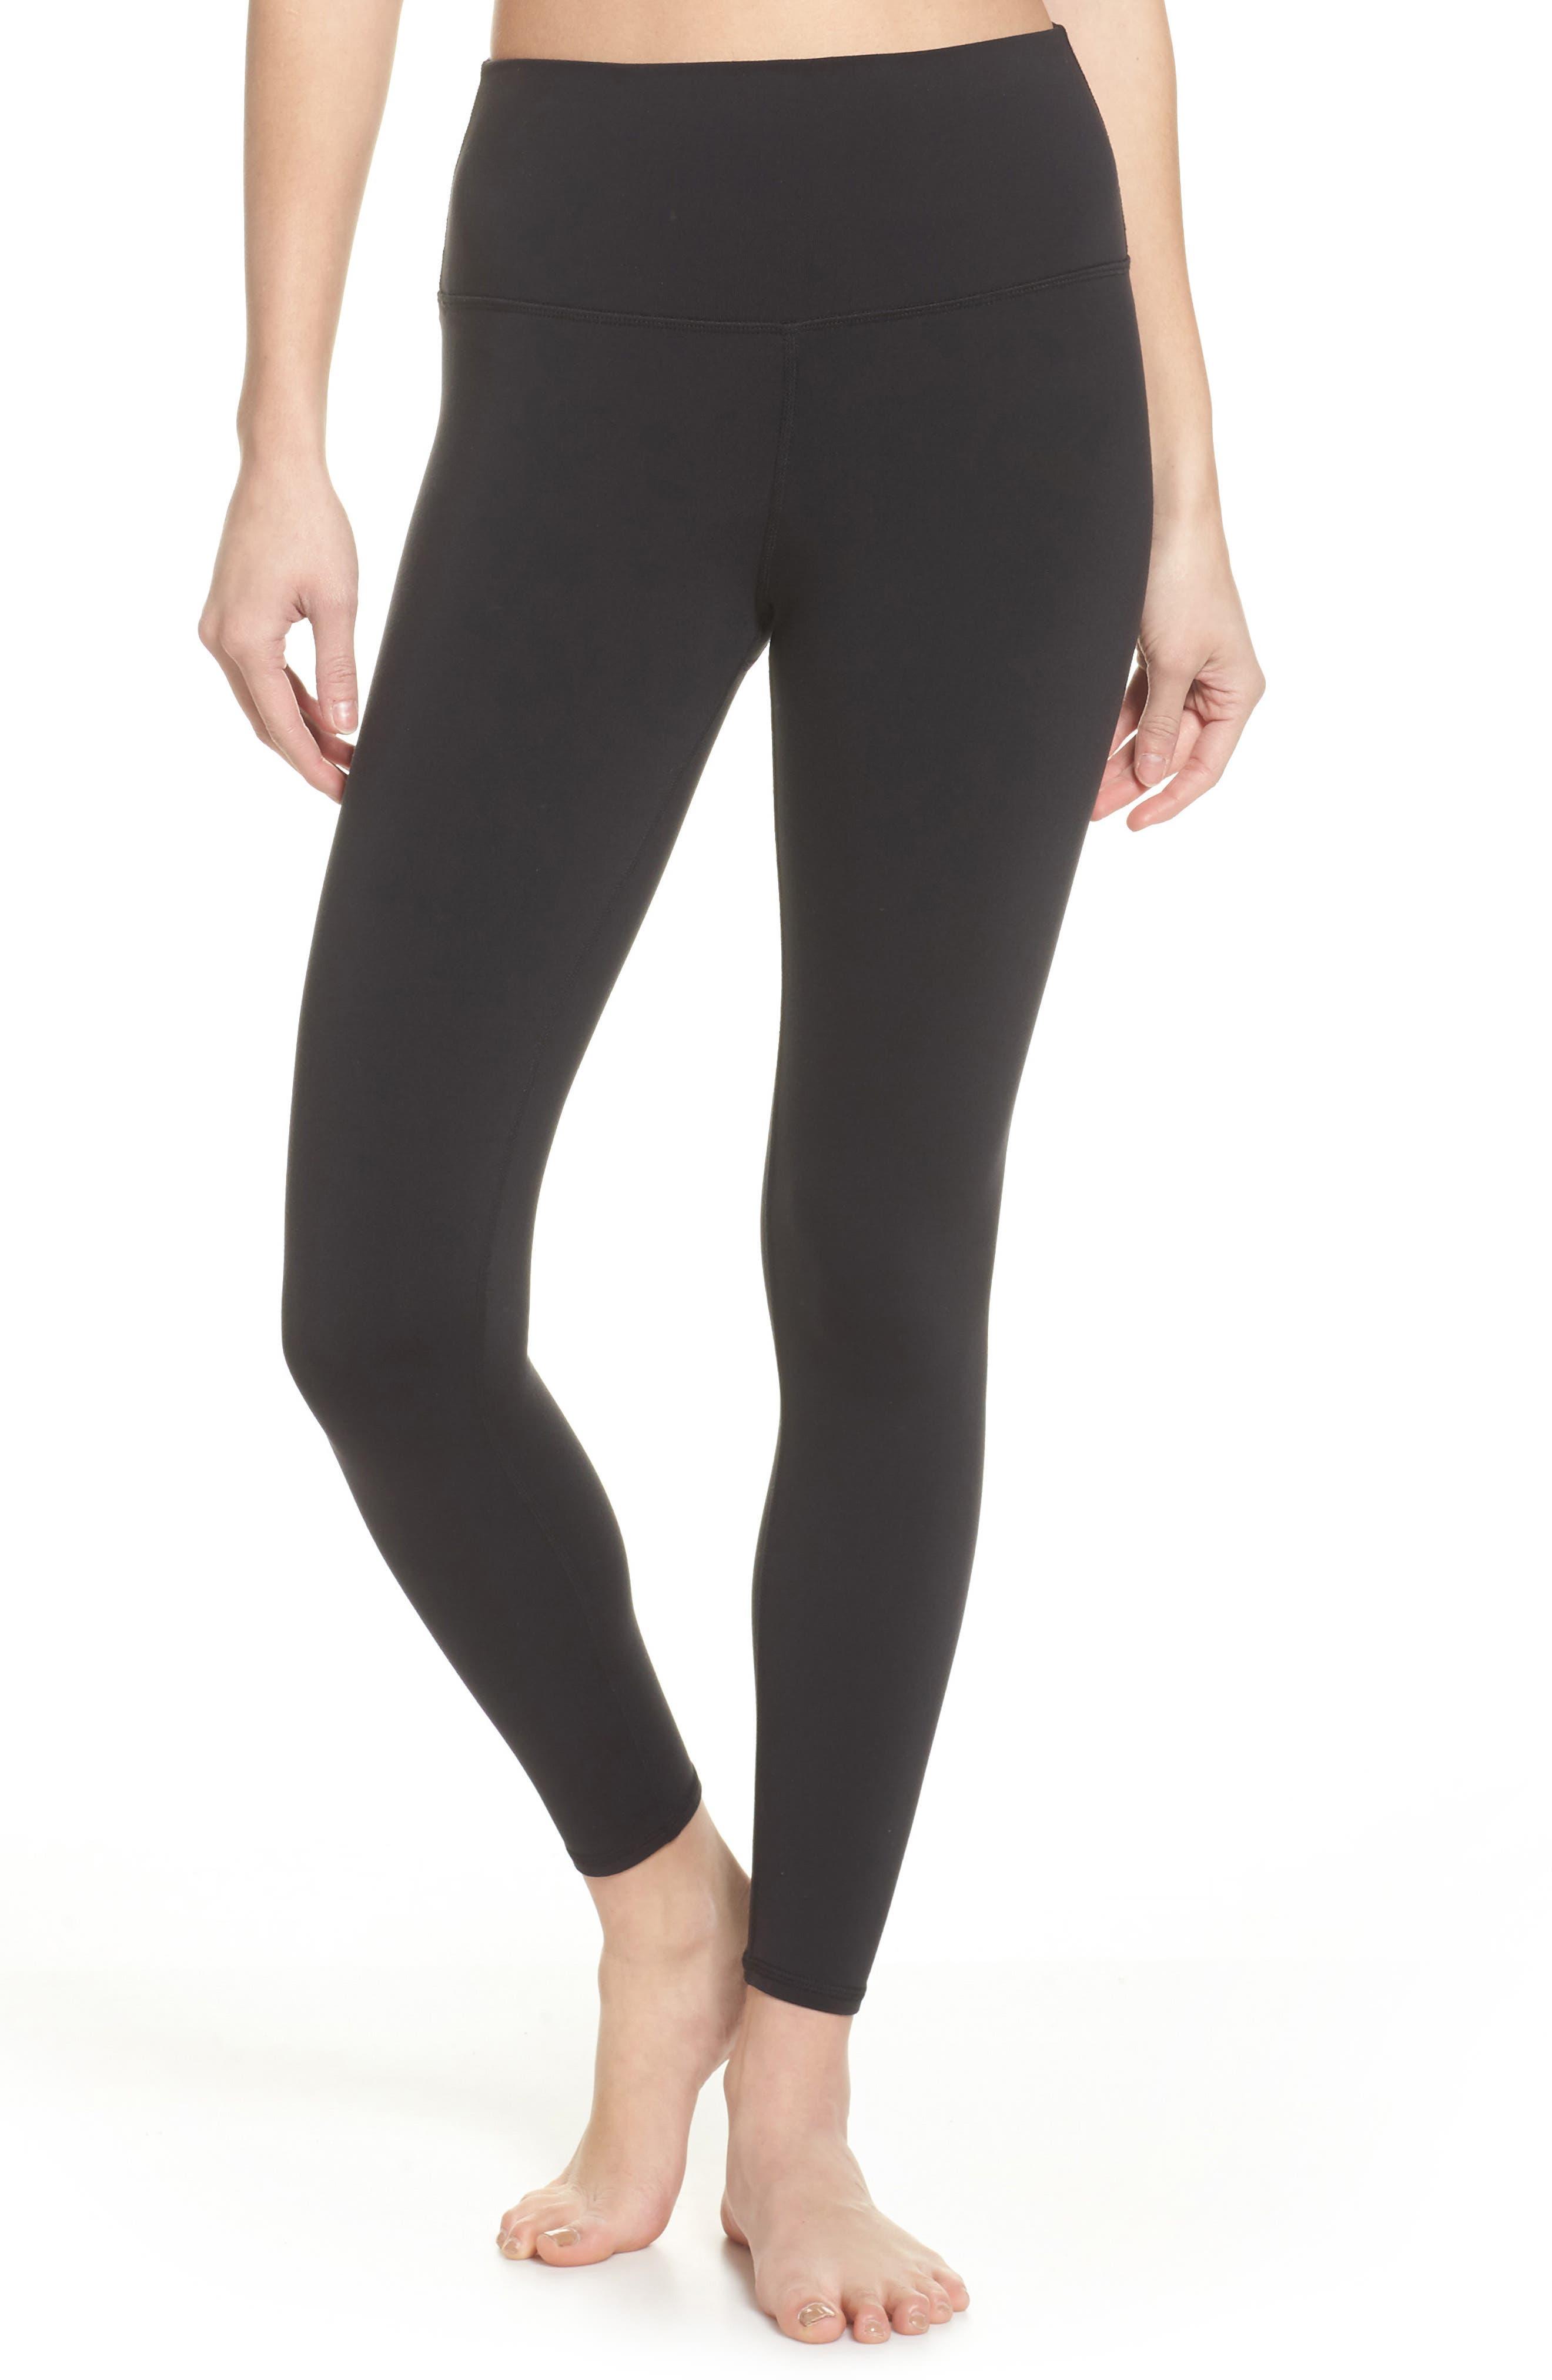 ALO Airbrush 7/8 High Waist Leggings, Main, color, BLACK